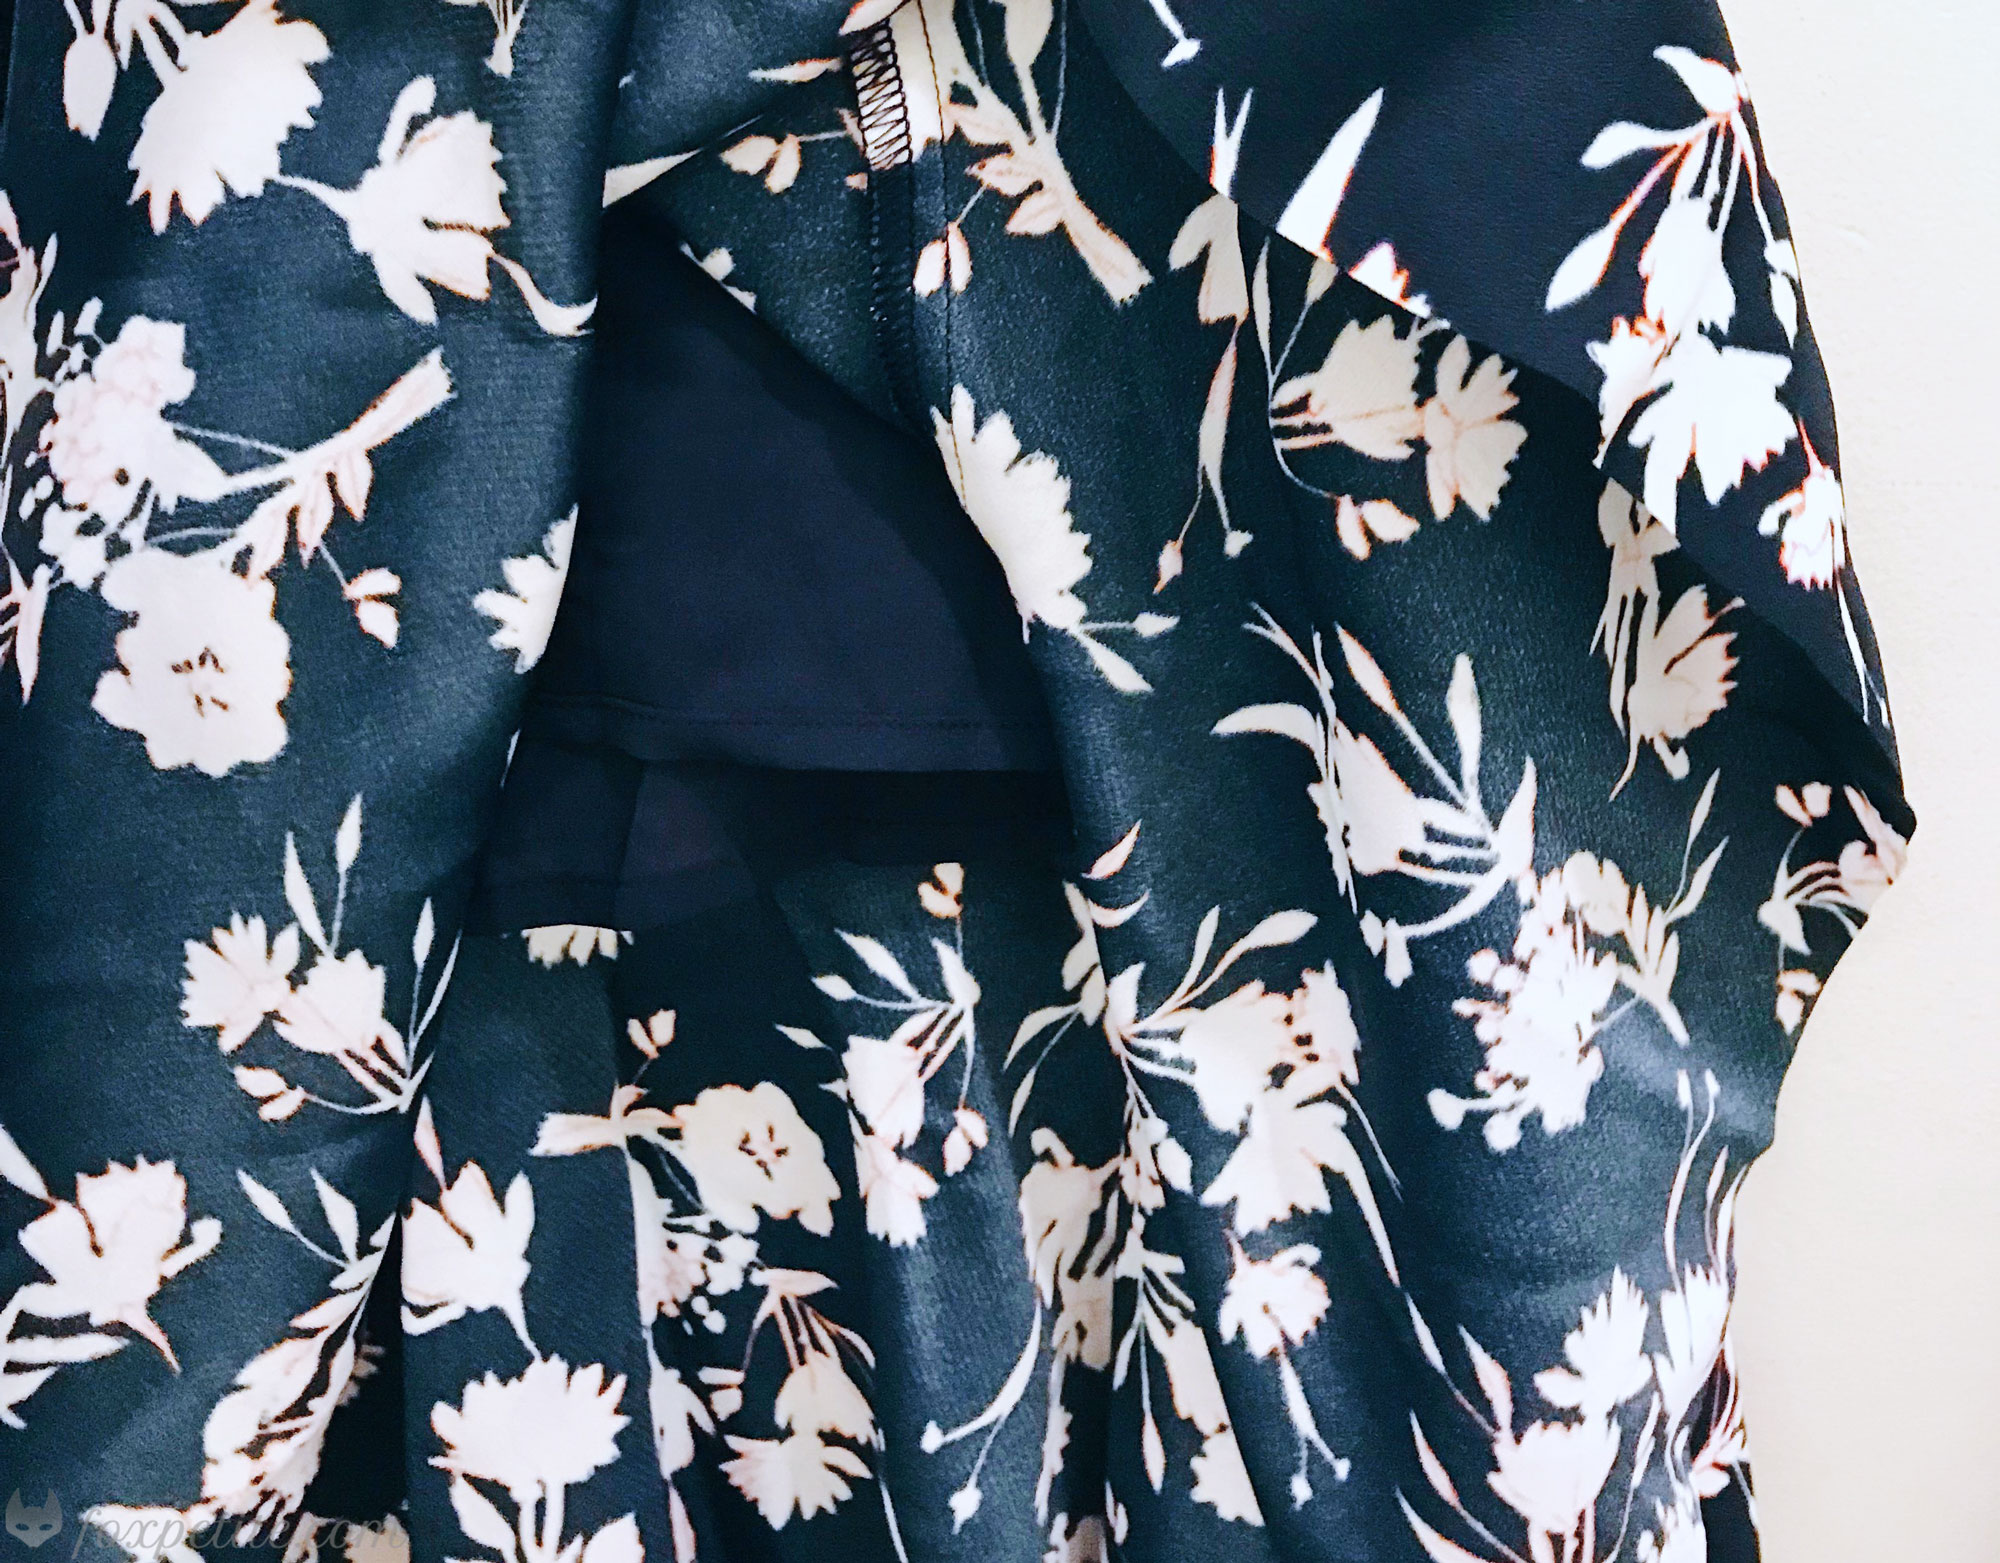 Floral Drop-Waist Shift Dress  in 00 Petite